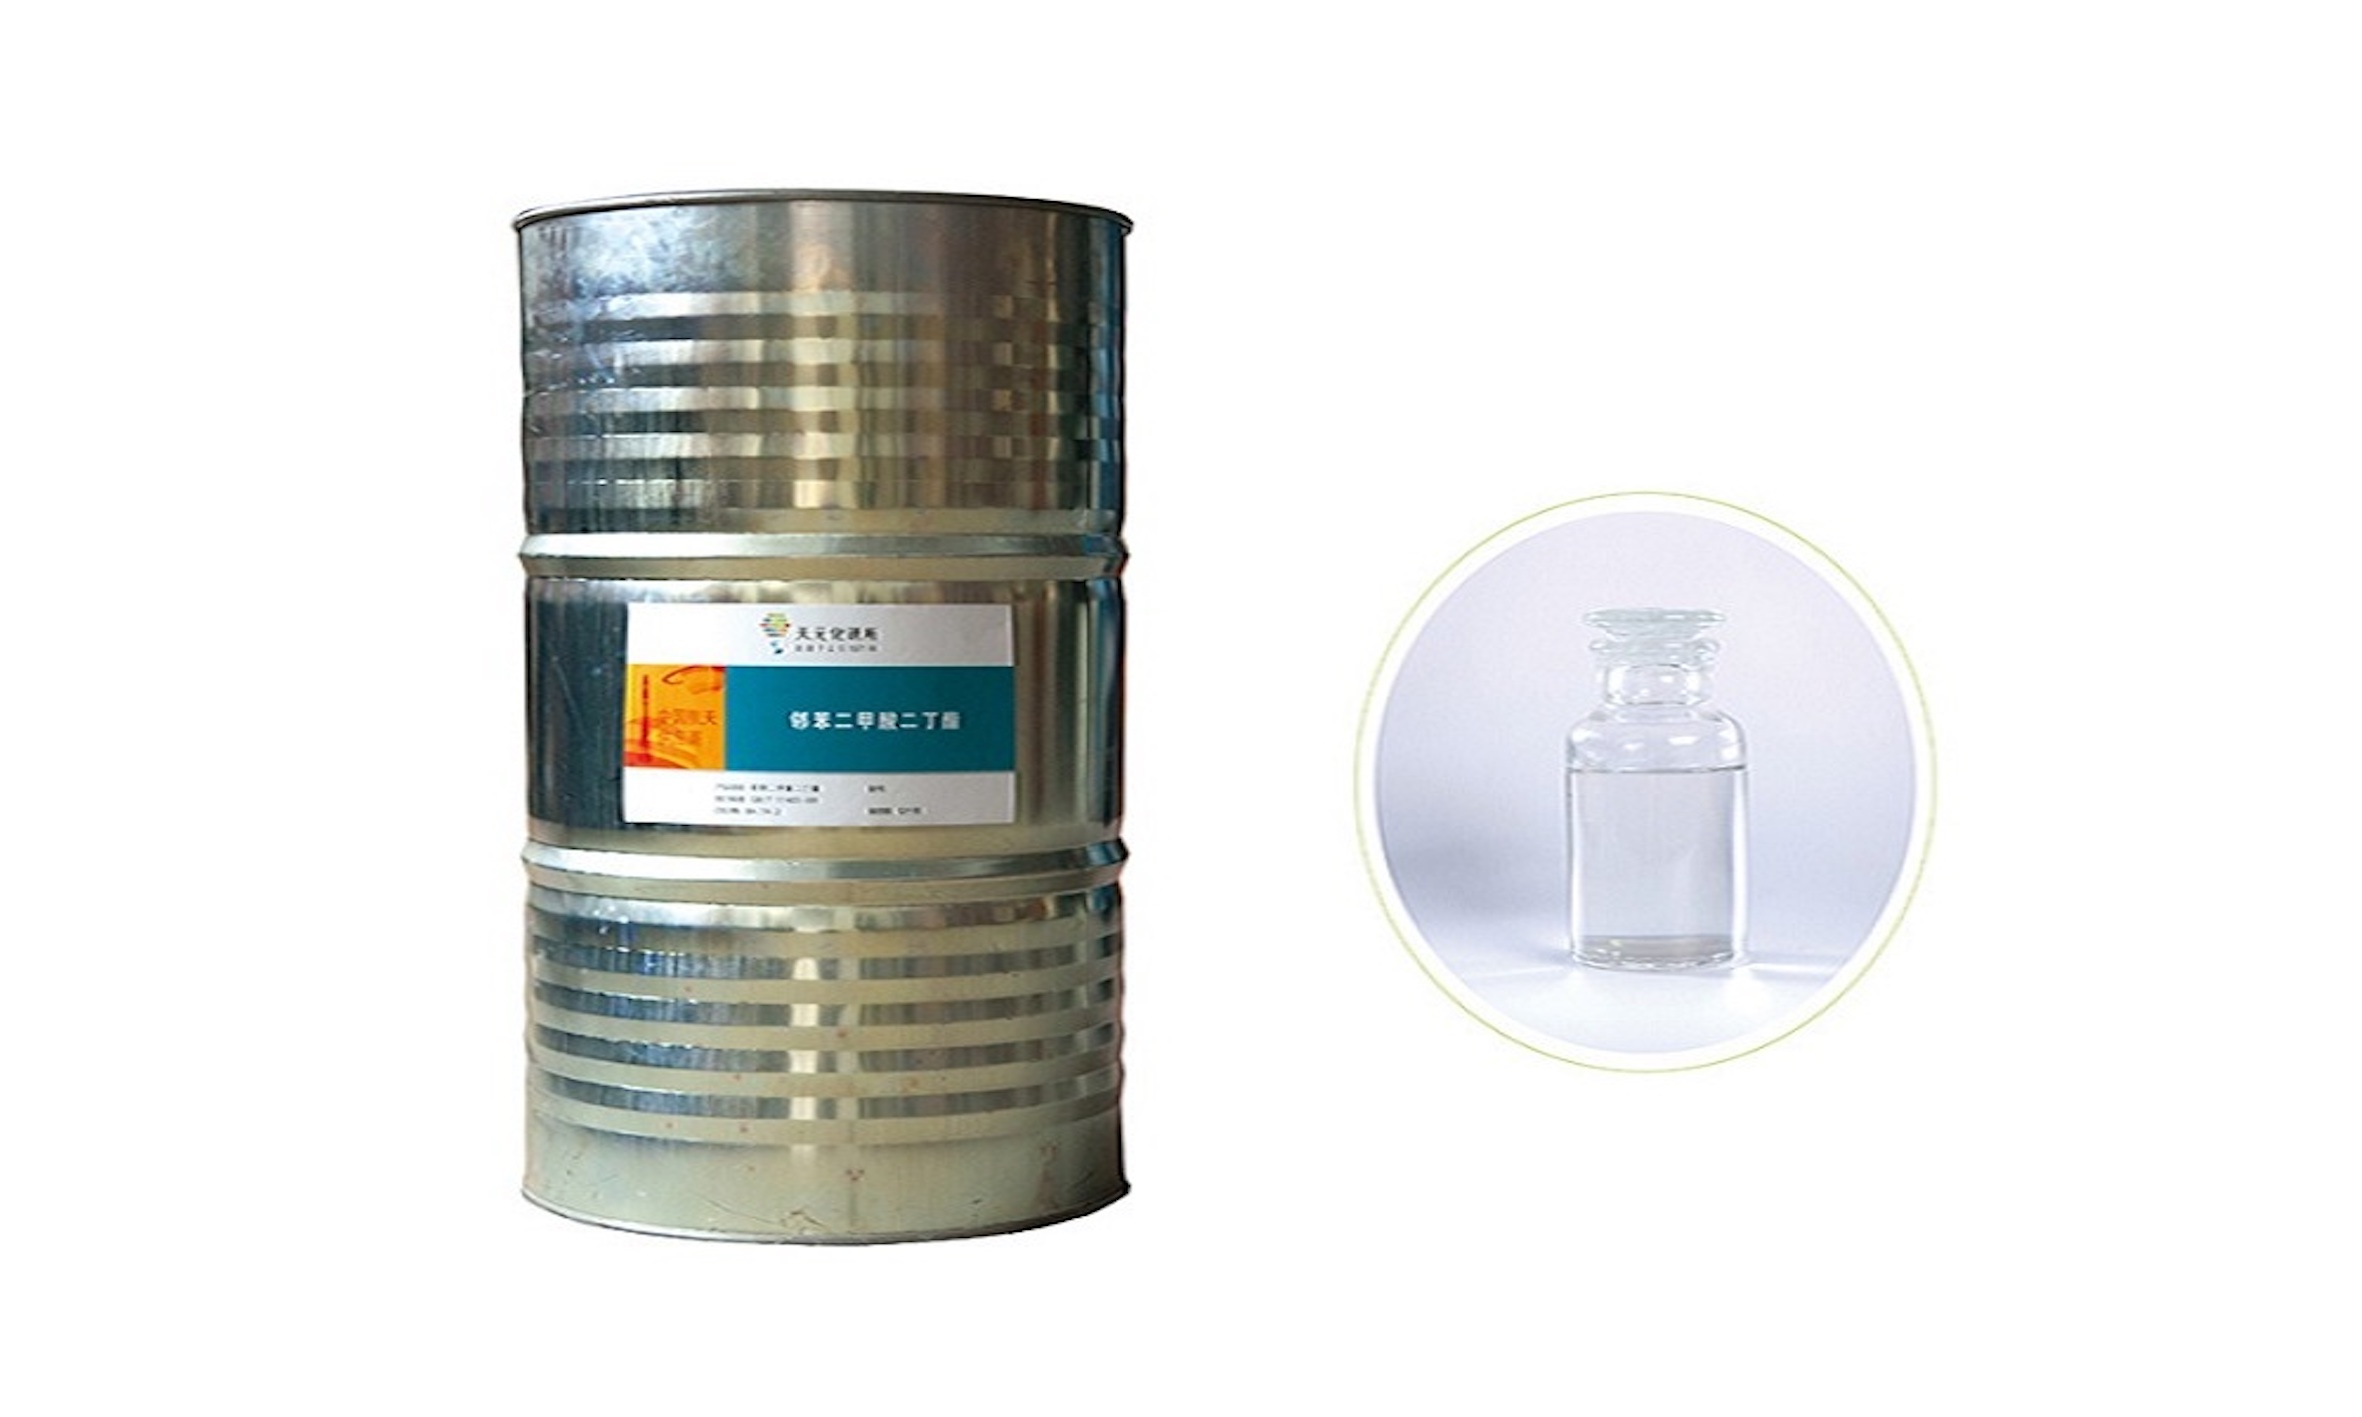 tanyun manufacture price plasticizer Dibutyl phthalate / CAS: 84-74-2/DBP